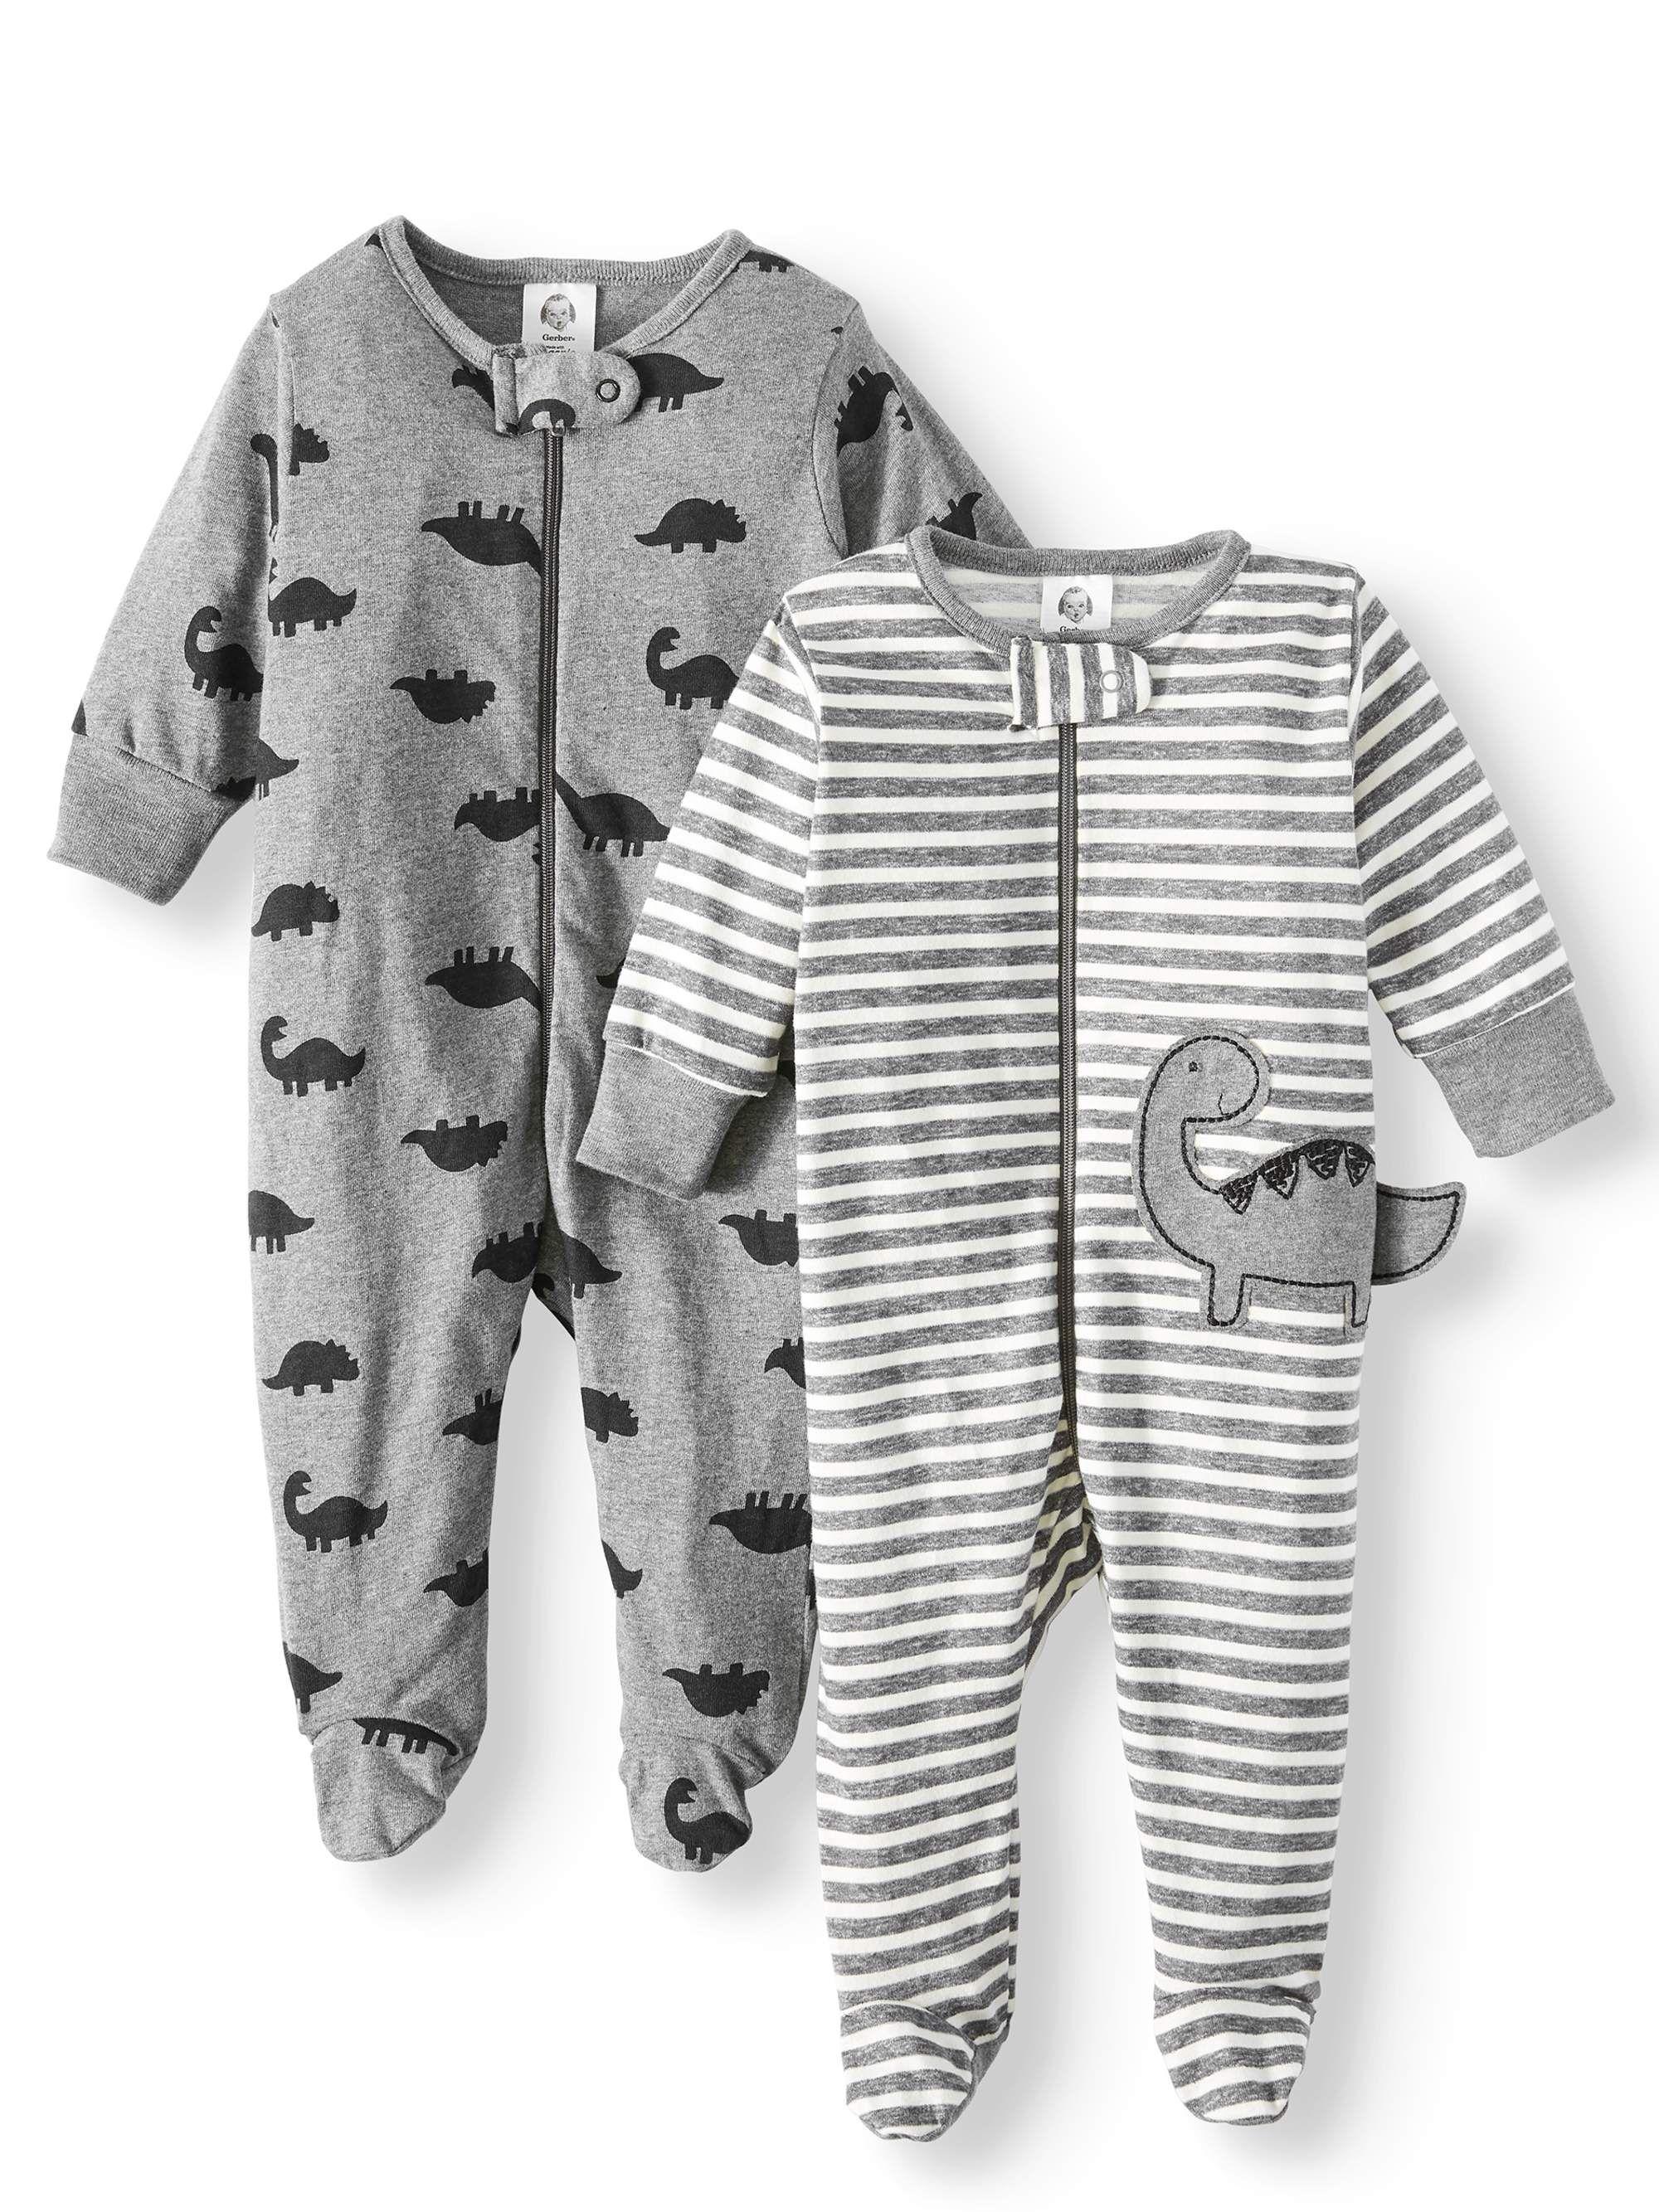 Gerber - Gerber Baby Boy Organic Cotton Zip Front Sleep N Play